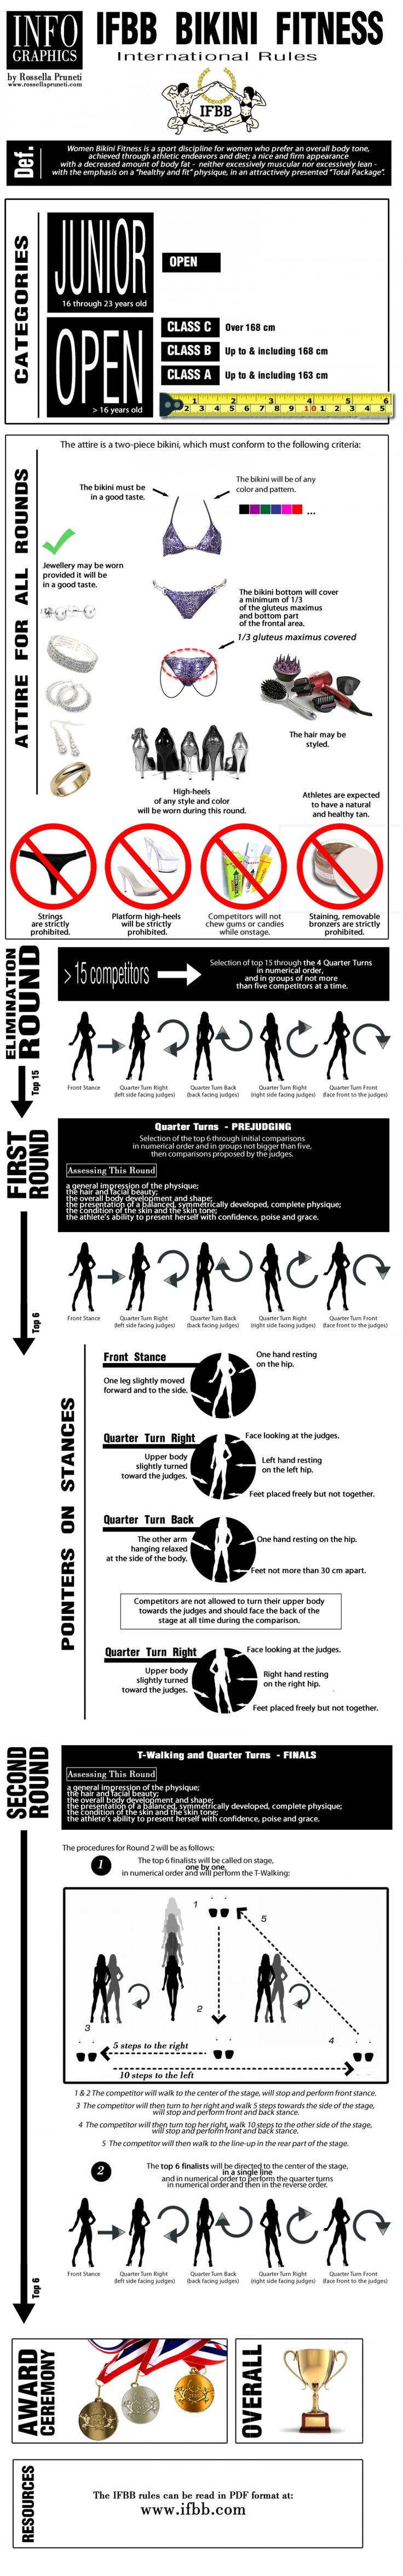 IFBB Bikini Fitness - International Rules (as of July 2013) Infographic